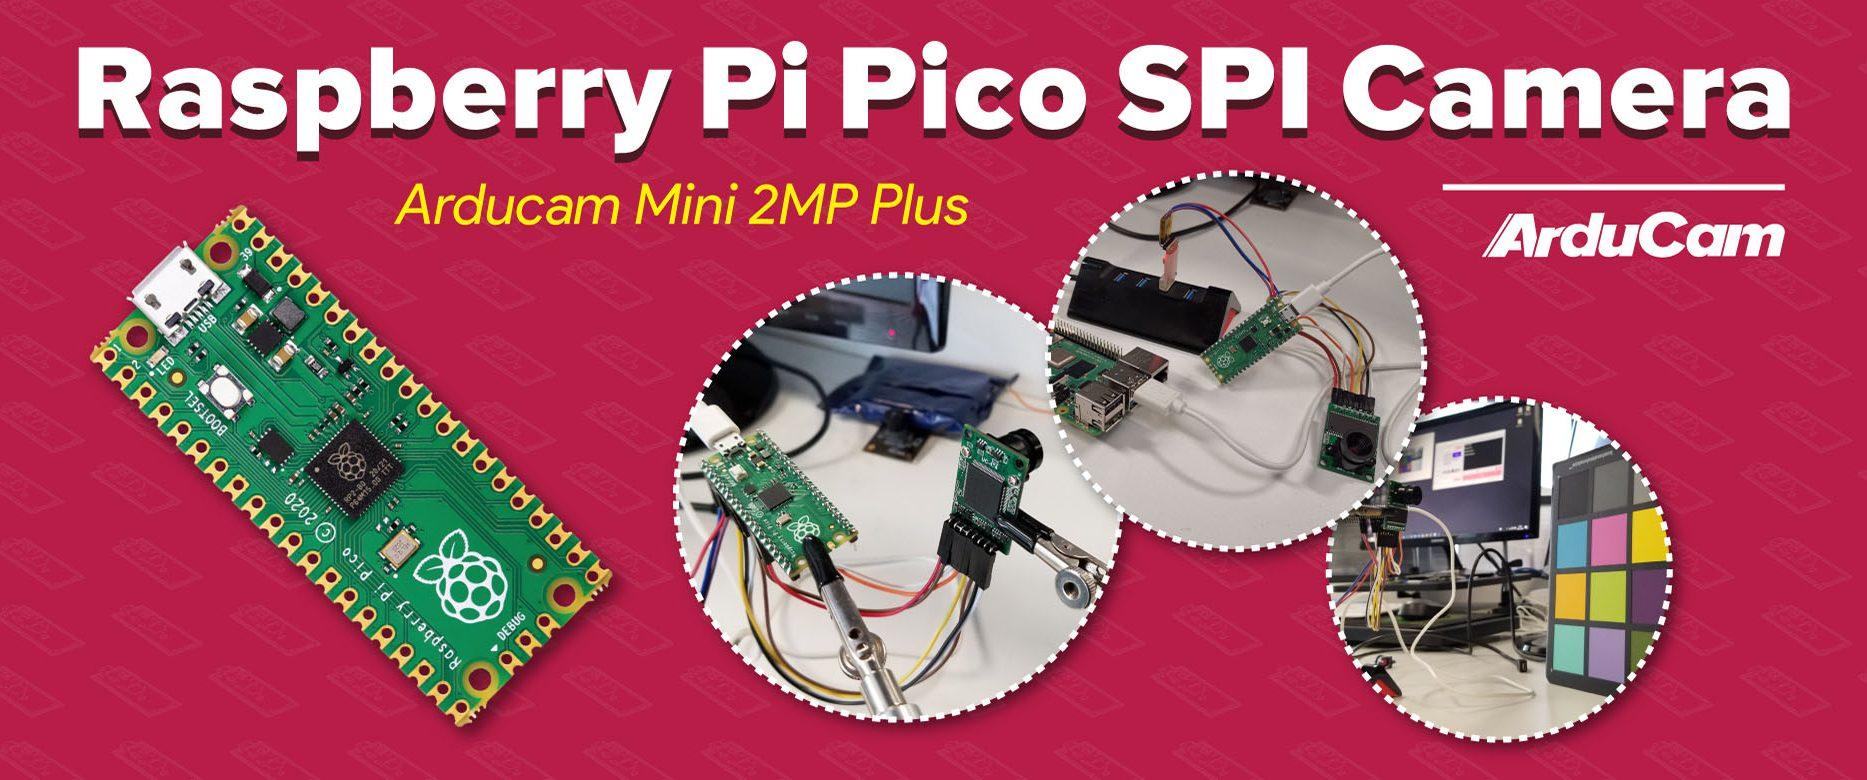 raspberry pi pico camera arducam mini